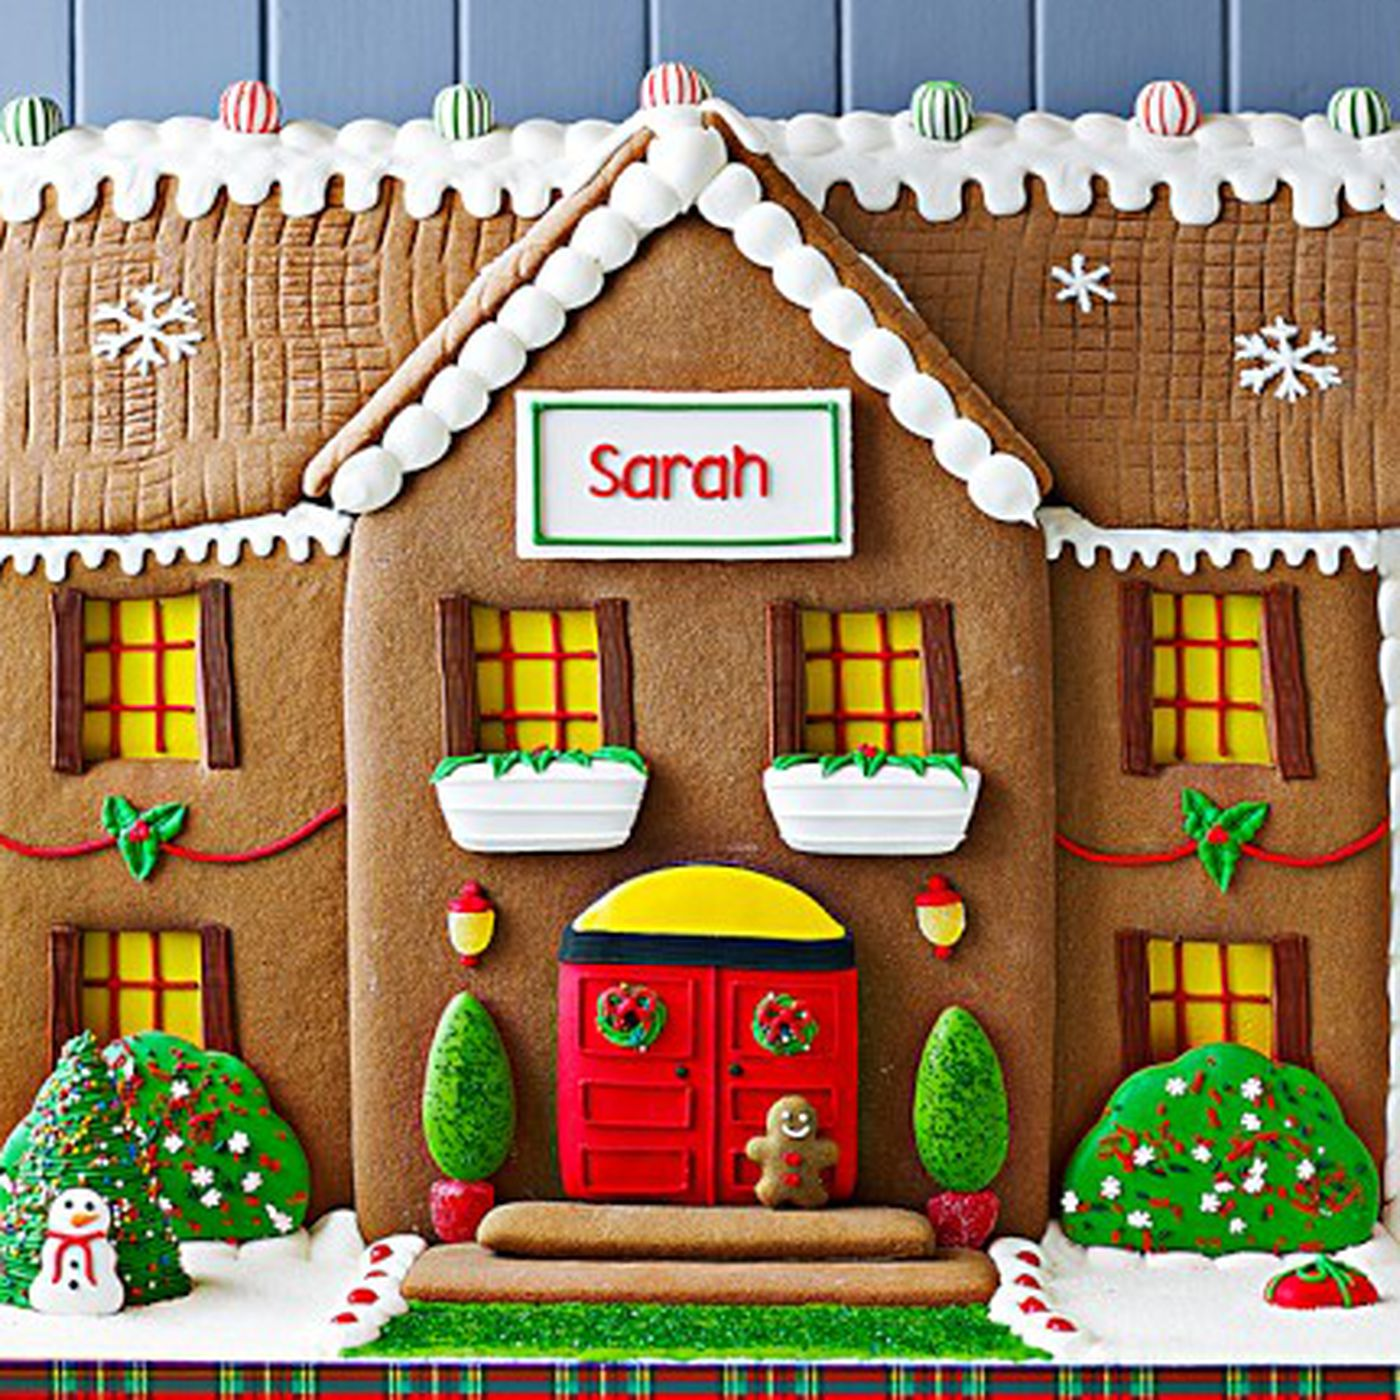 Williams Sonoma Christmas Catalog.Writer Finds Williams Sonoma Holiday Catalog Horribly